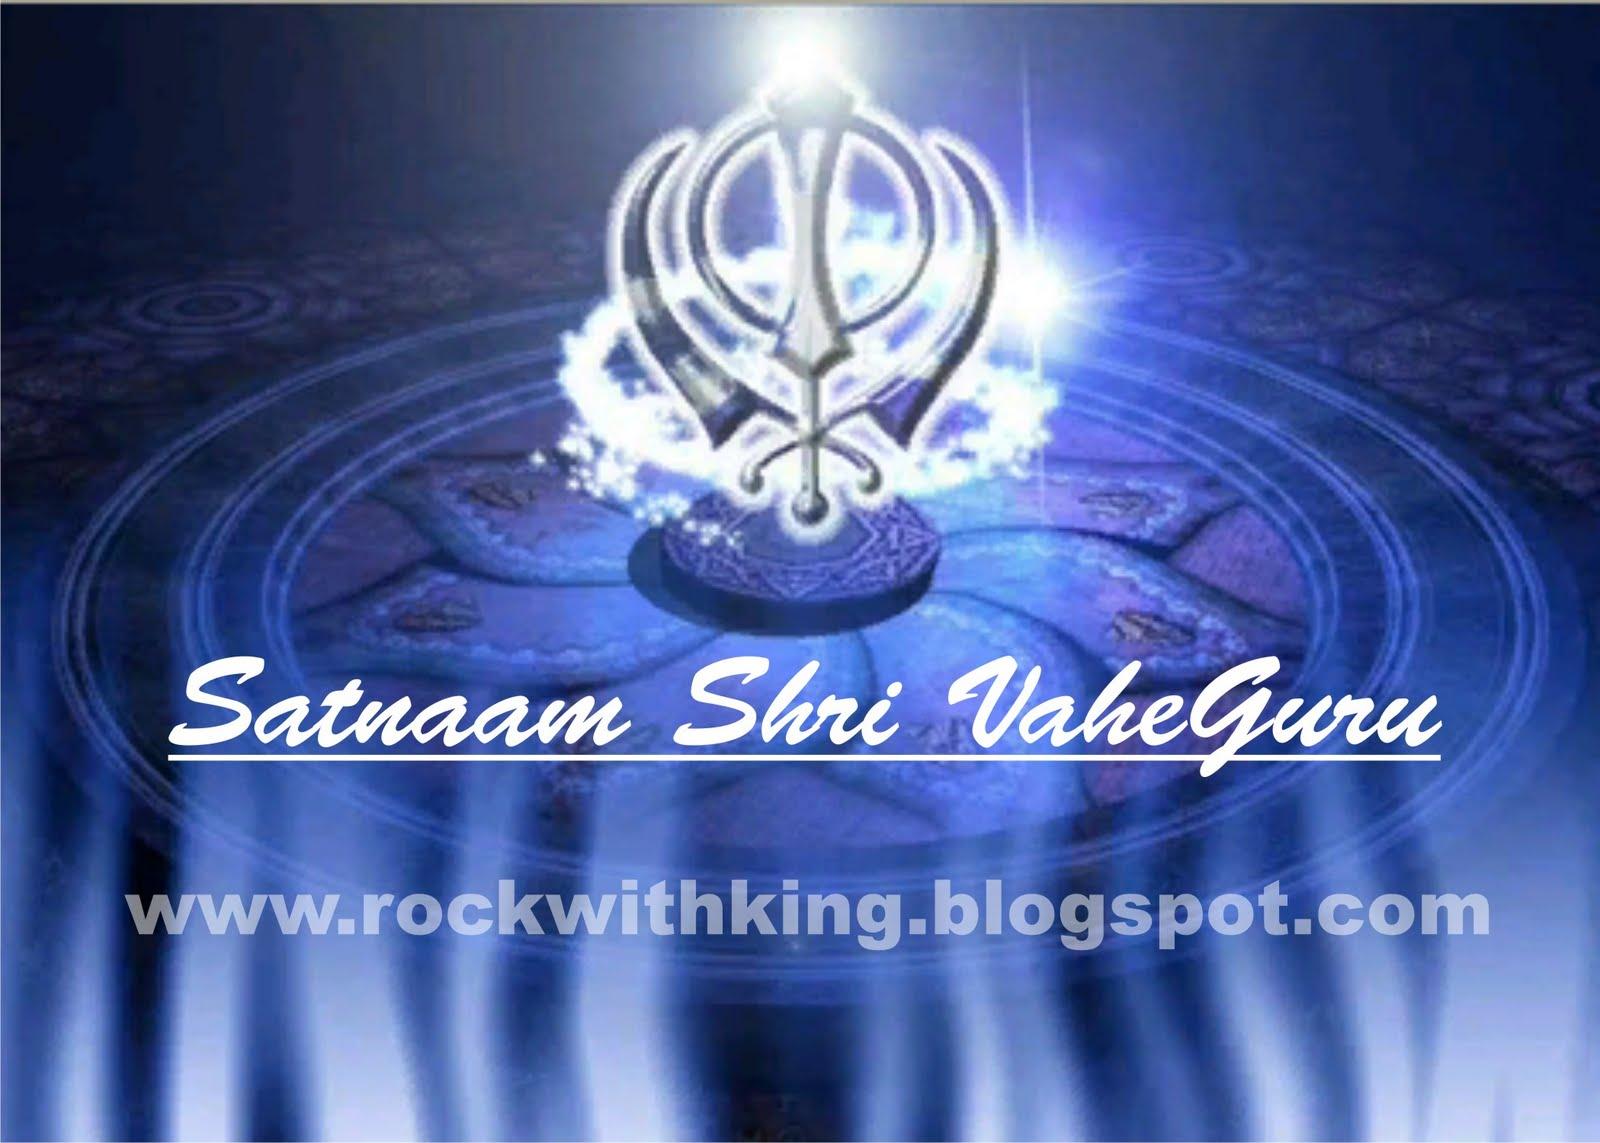 http://1.bp.blogspot.com/_XthU8JporOo/S-OVfaHe4EI/AAAAAAAAAwE/dSaBr6gzTbM/s1600/guruvaani+on+rockwithking.jpg